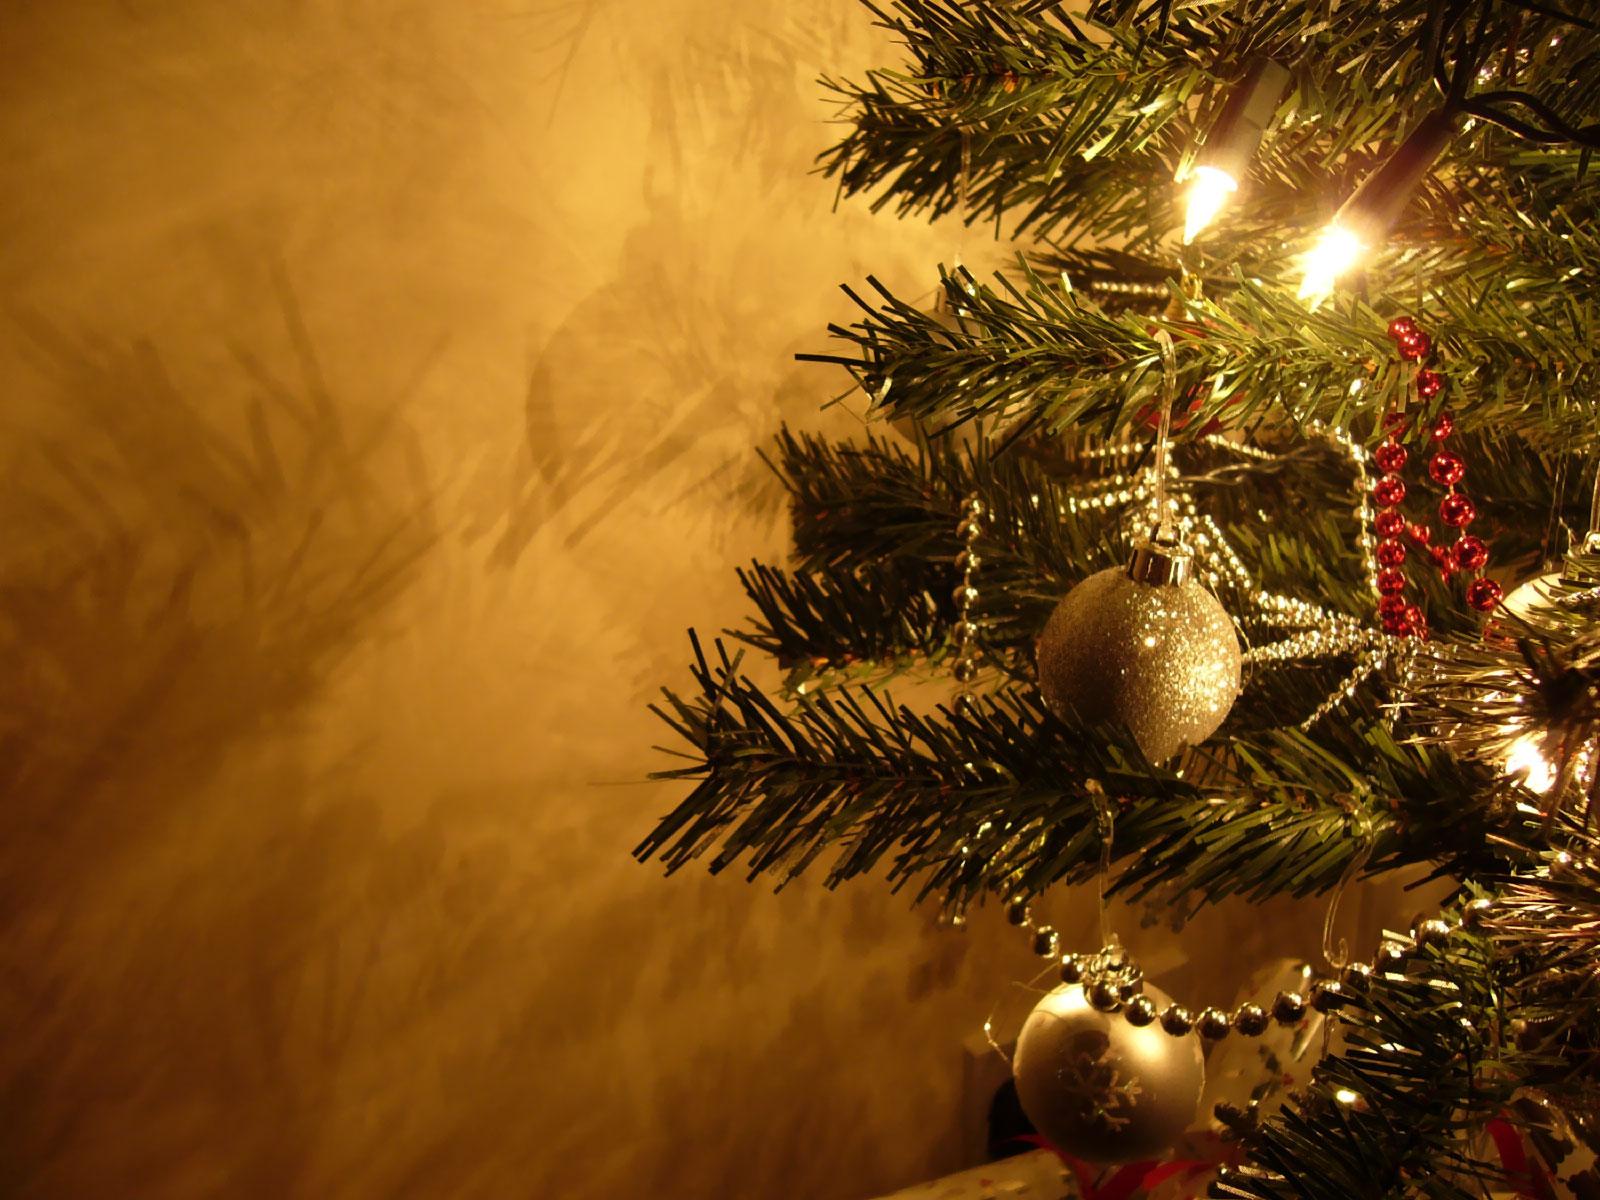 http://3.bp.blogspot.com/-UtOJ_x9q_e0/TvXLgg2mJsI/AAAAAAAADXc/3kSZ4b7xc78/s1600/Christmas+Wallpapers+in+High+Definition+%2528HD%2529+1600+X+1200.jpg